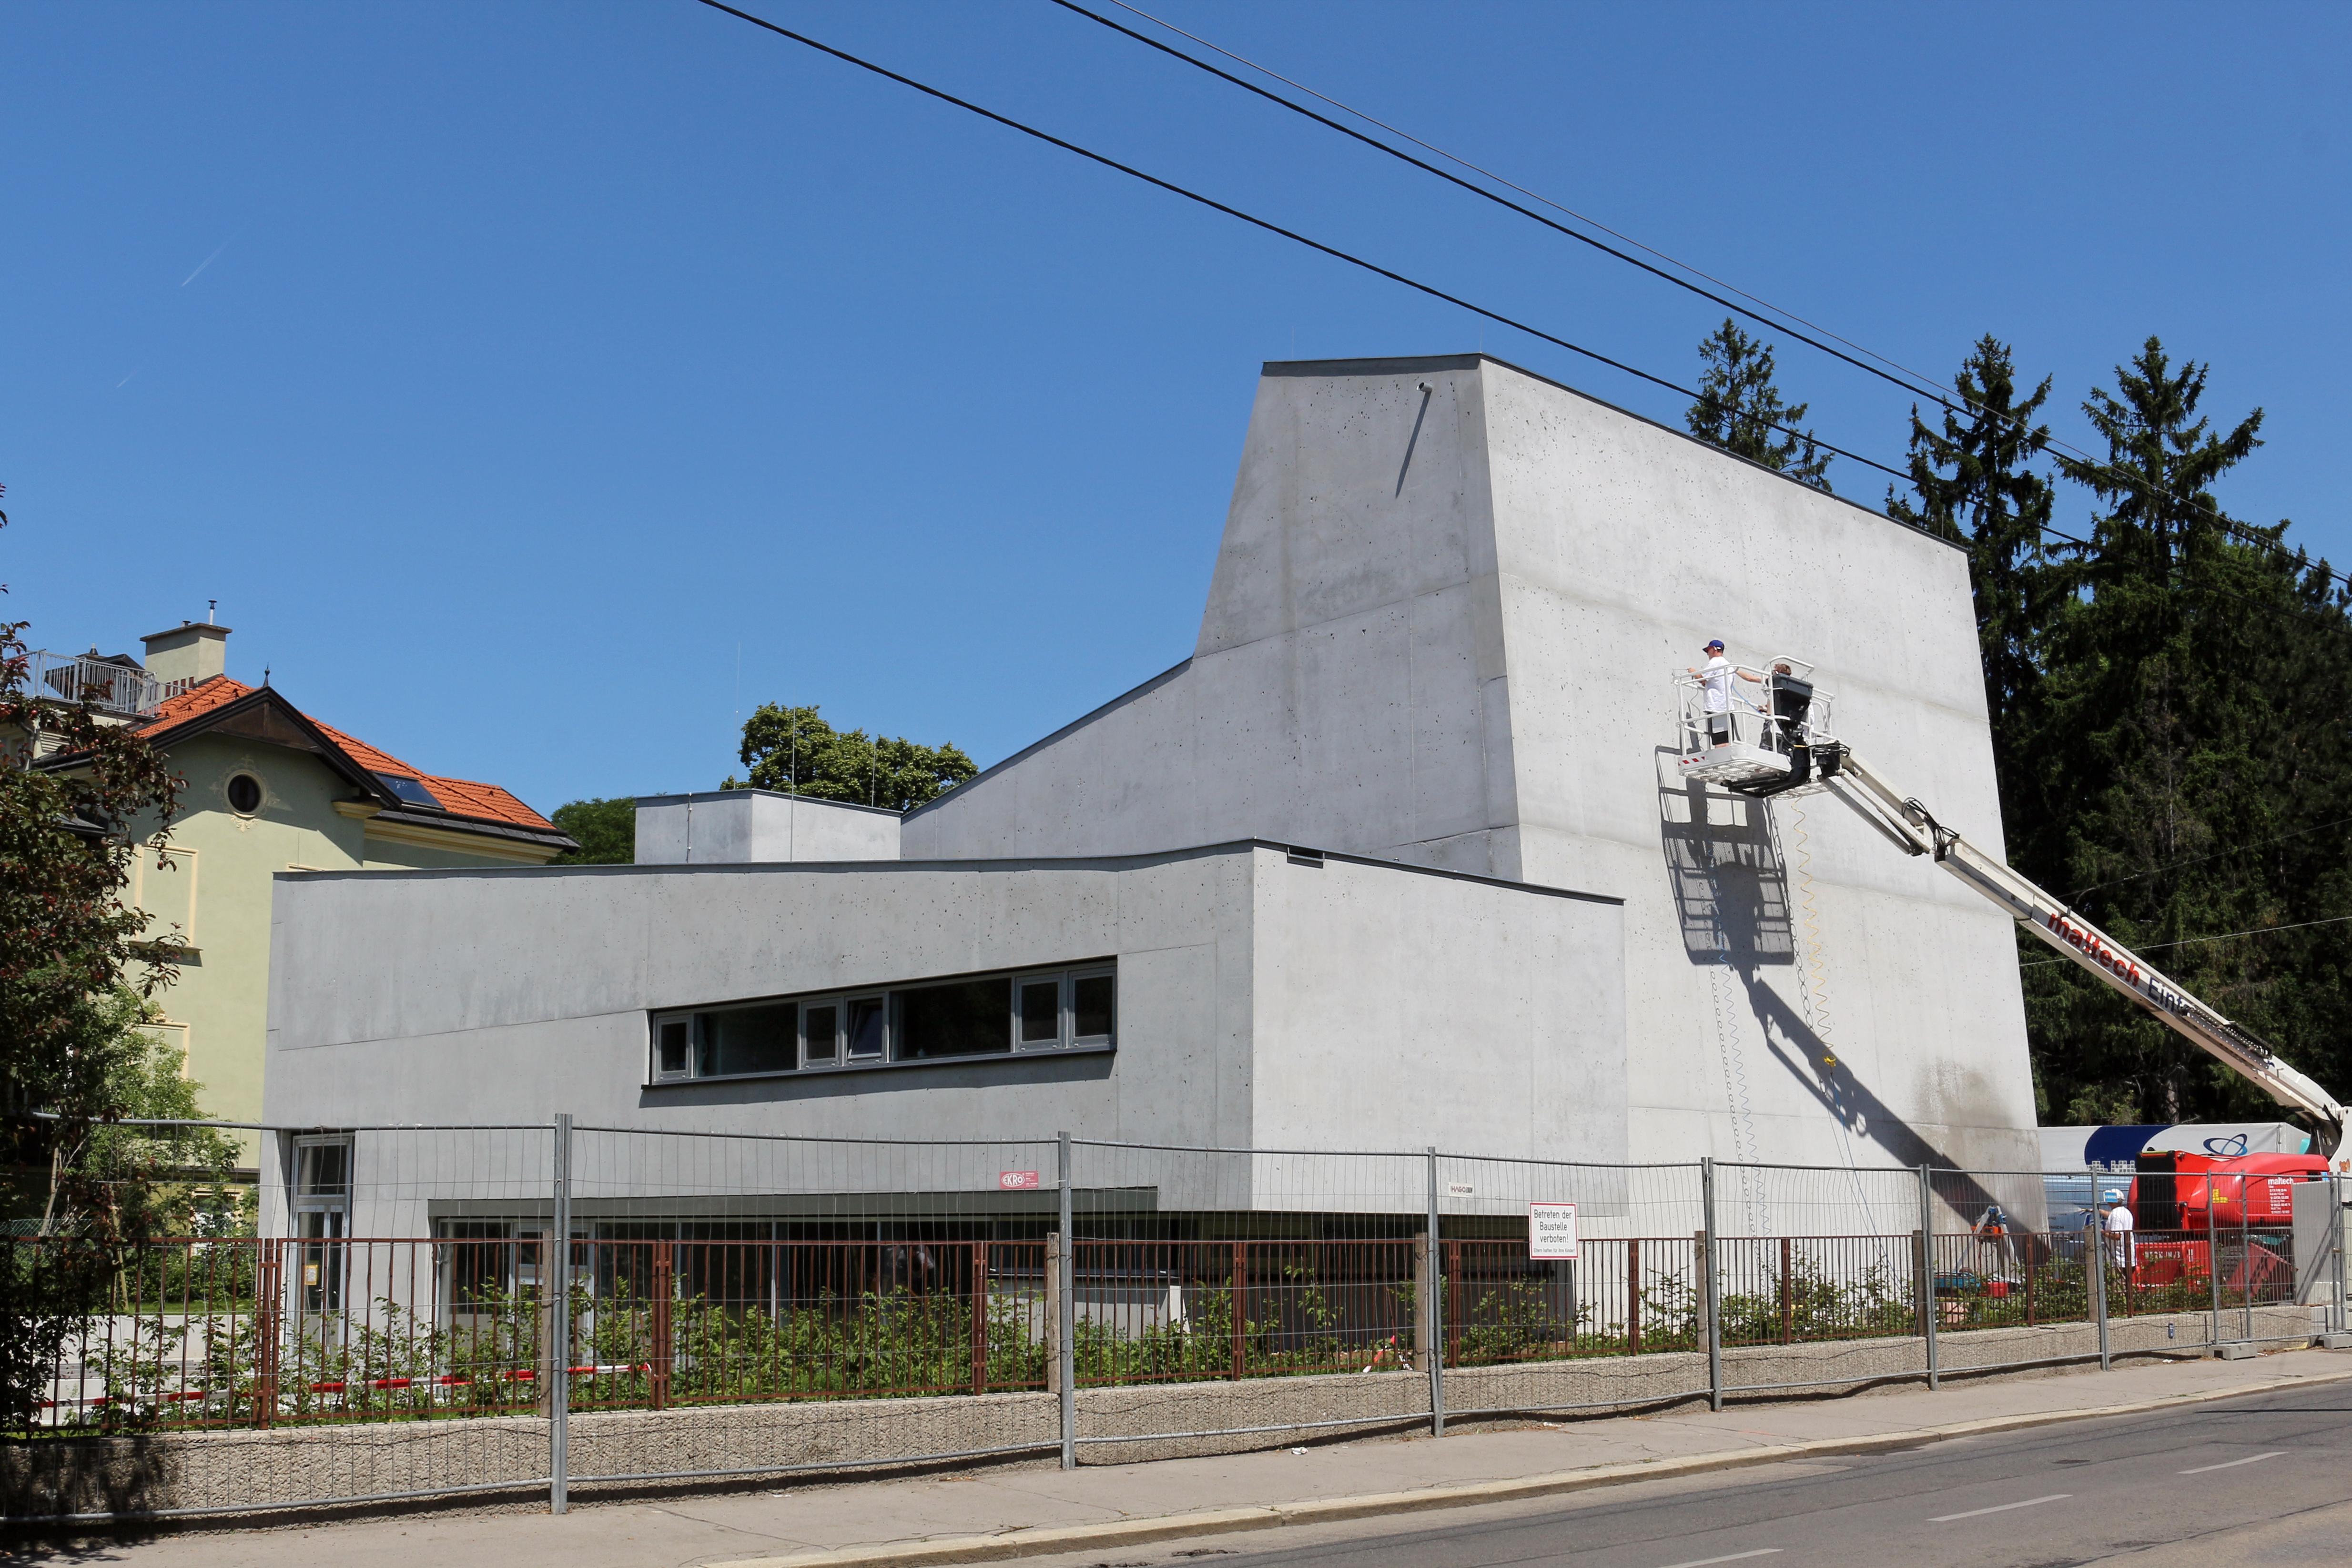 File:Wien-Penzing - Neubau der Neuapostolischen Kirche.jpg ...